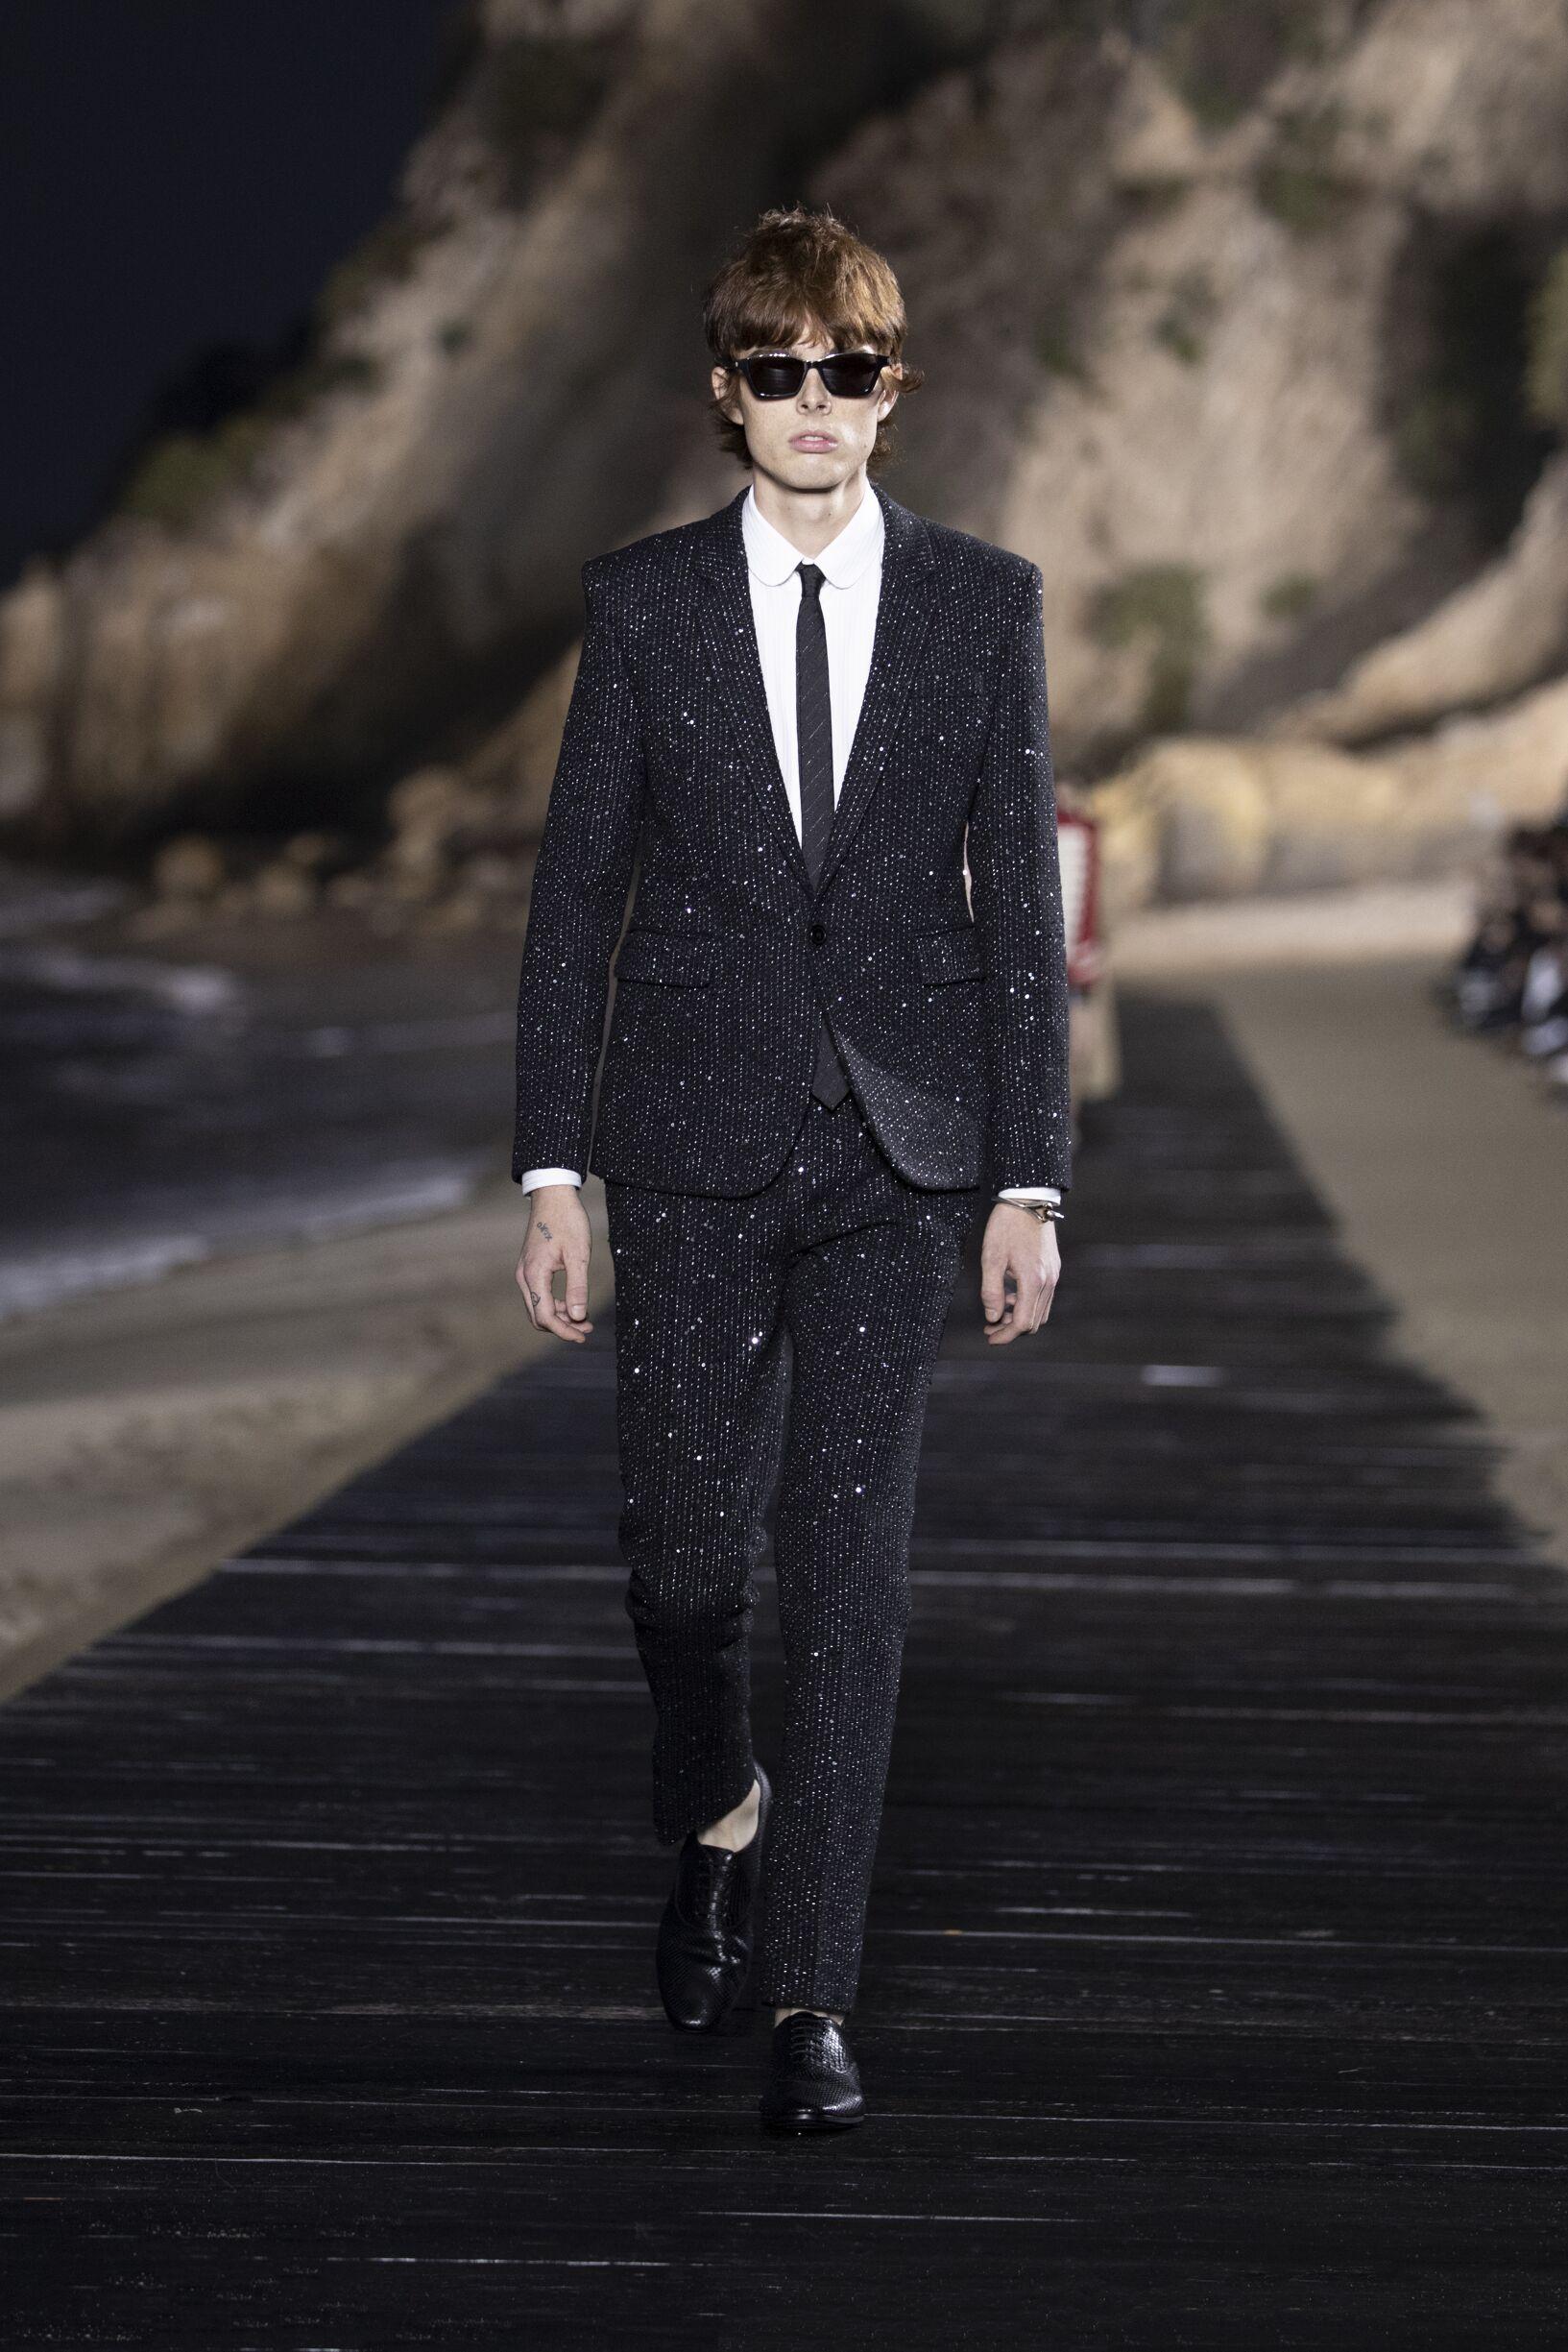 Fashion Model Saint Laurent Catwalk